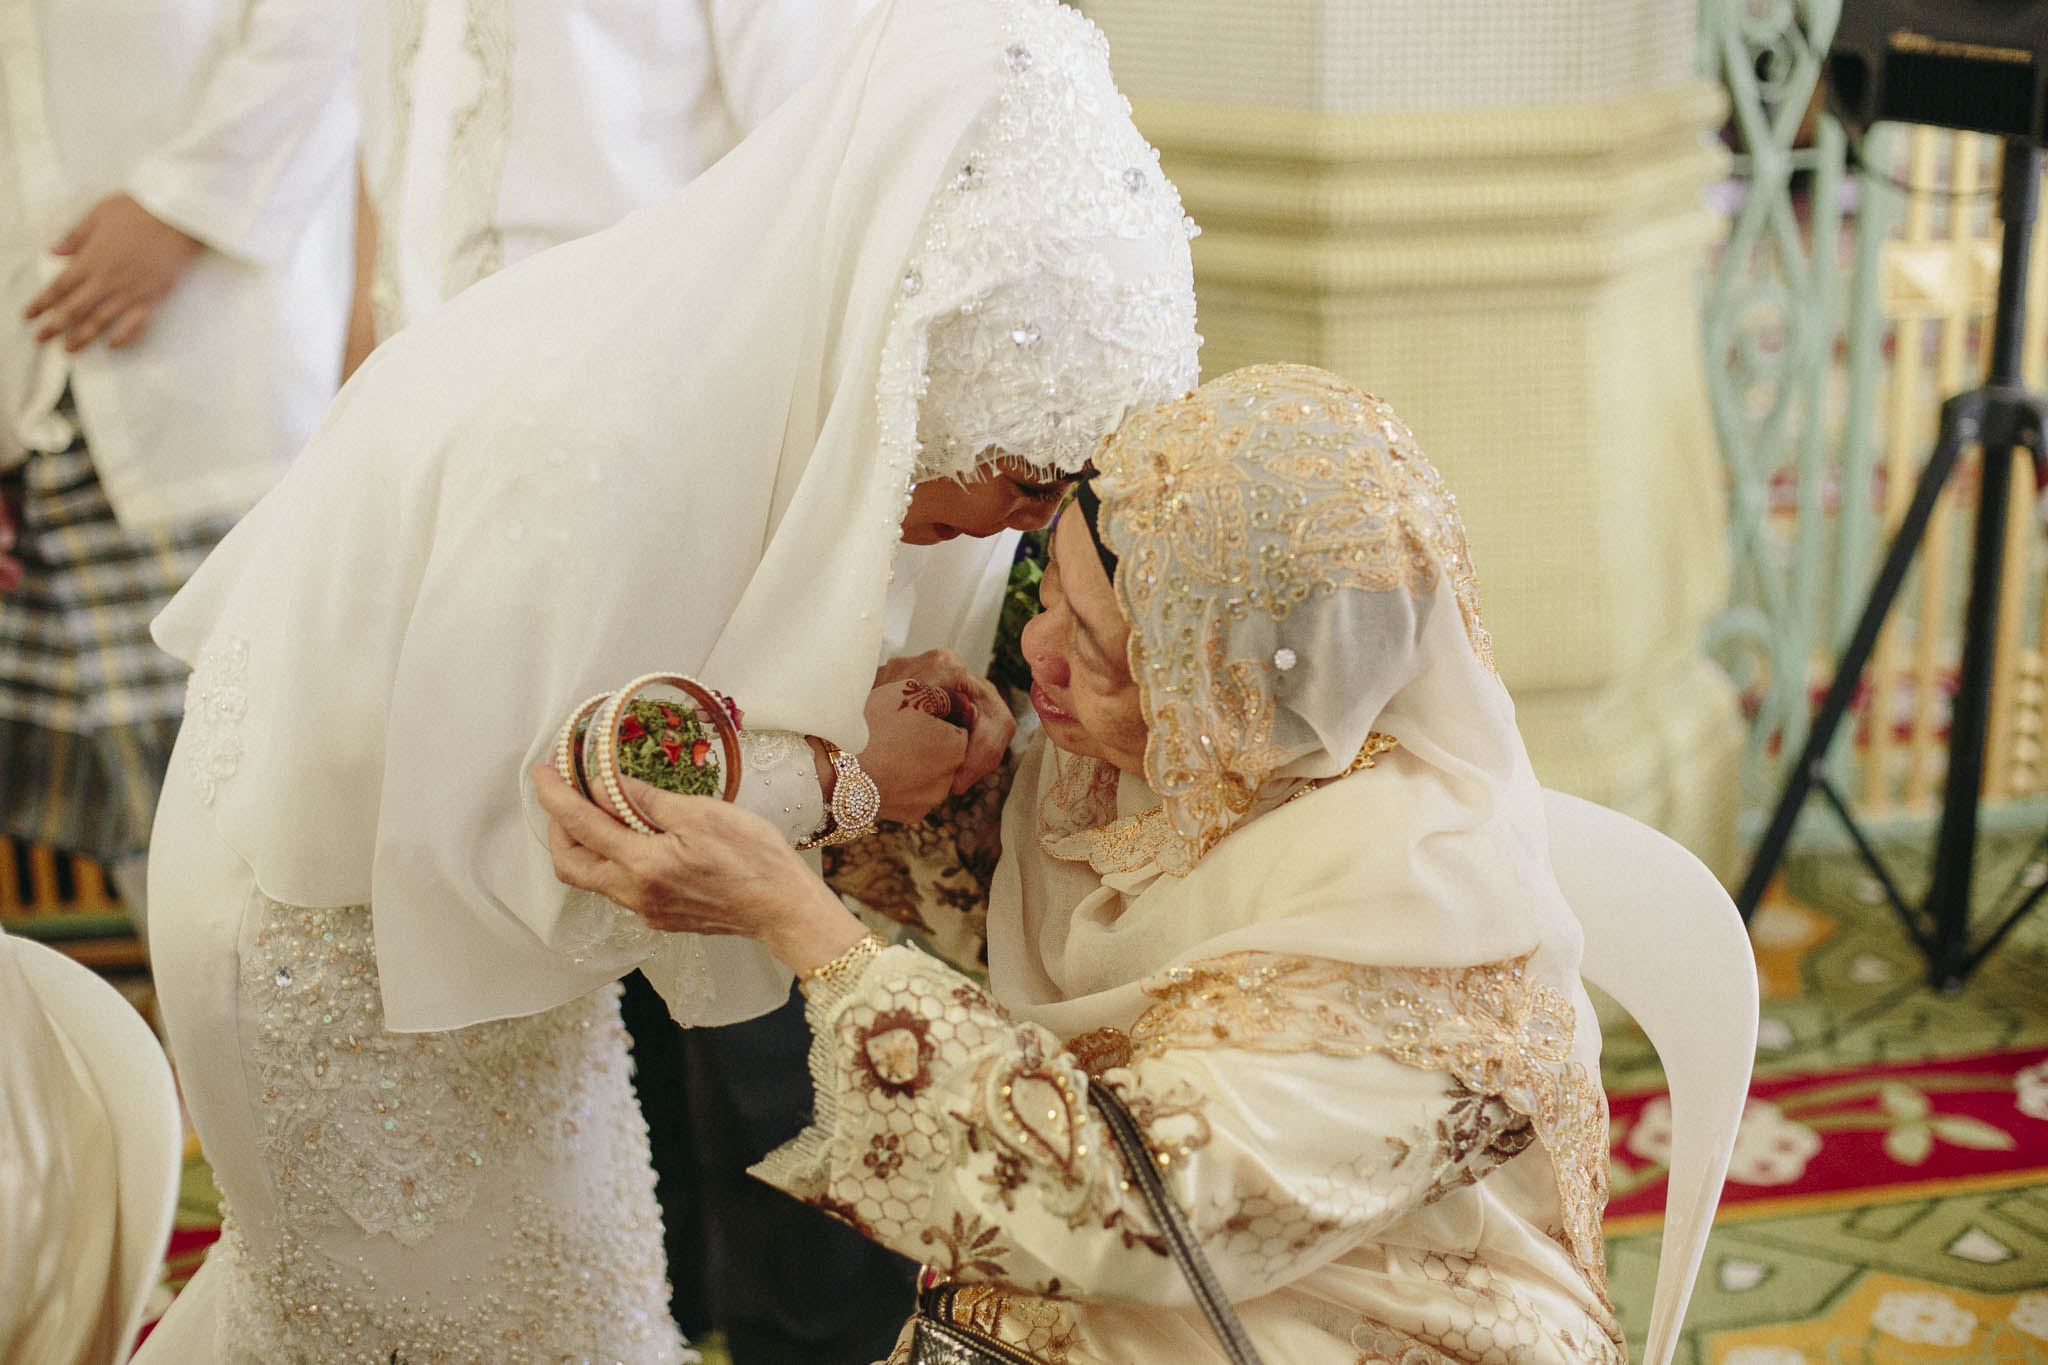 singapore-wedding-photographer-travel-khairul-atikah-23.jpg